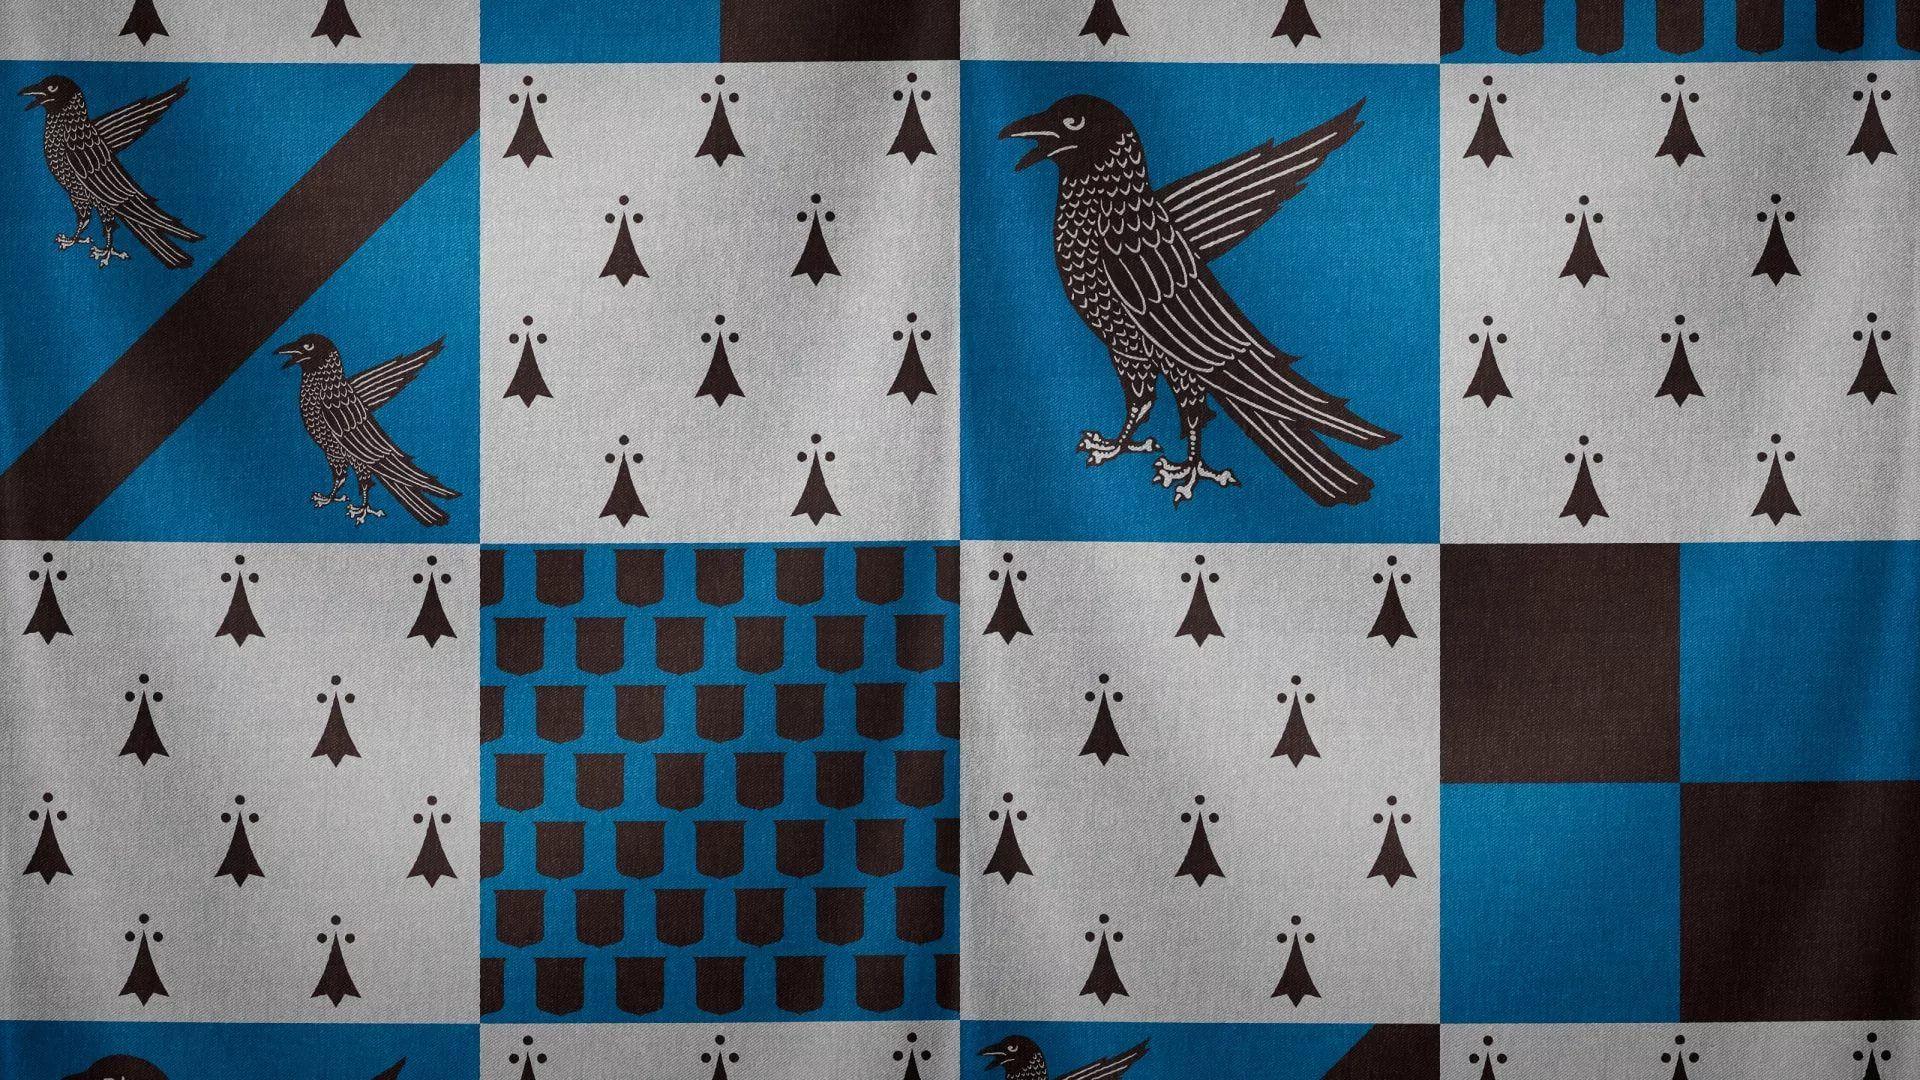 Ravenclaw free download wallpaper